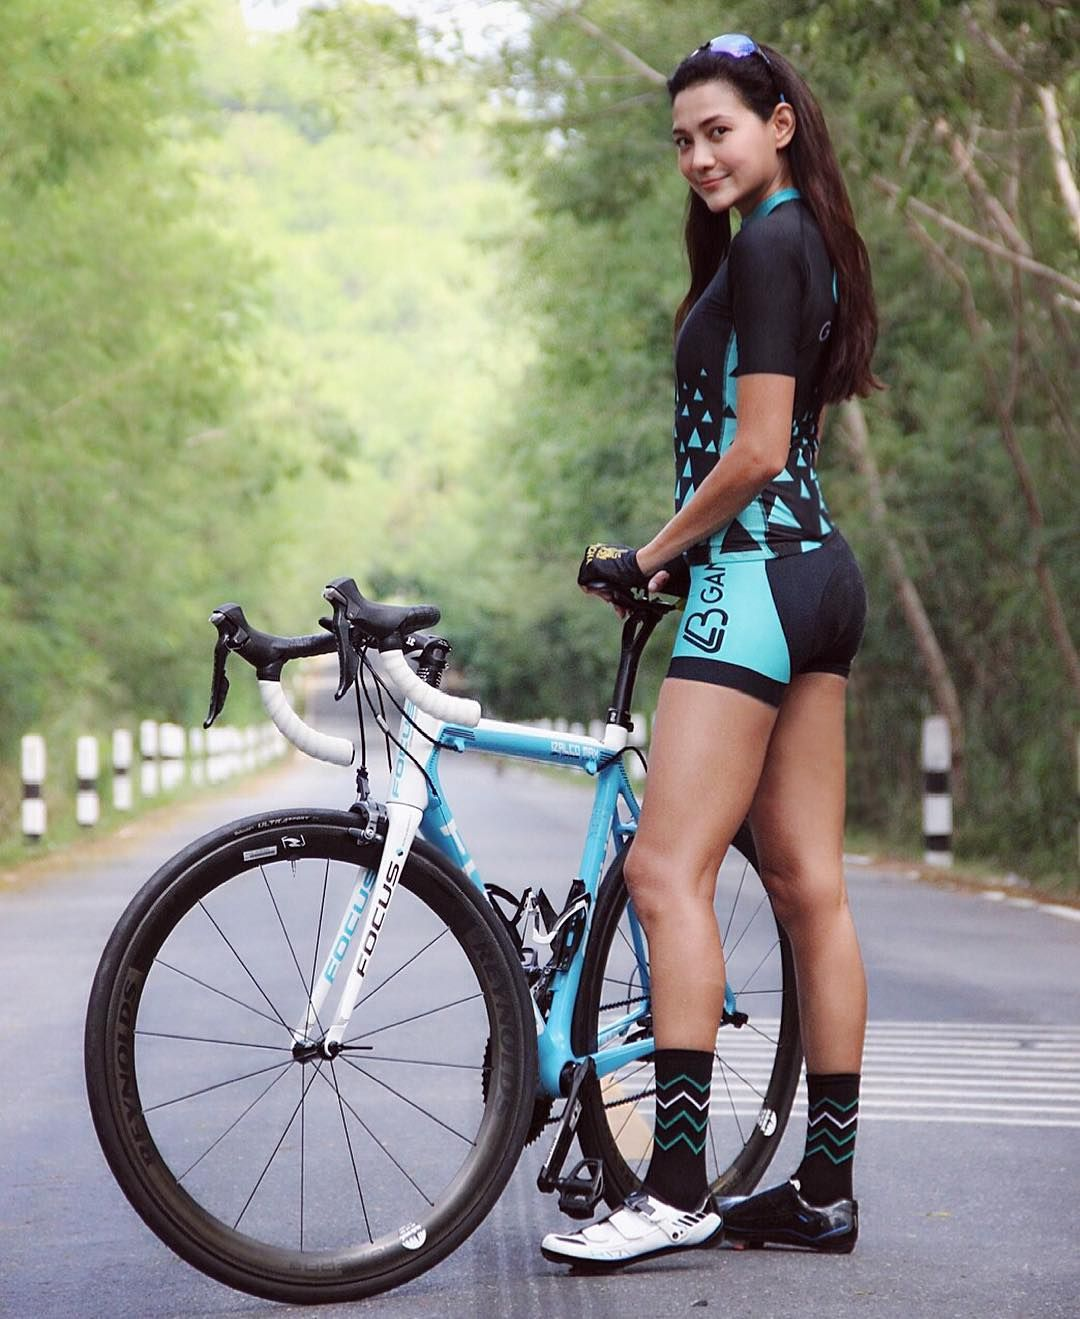 Yoyo Thai Athlete Herbalife Brand Ambassador Singha Focus Adidas Bkk Team Captain Marathoner Cycling Triathlon An In 2020 Cycling Women Cycling Outfit Female Cyclist